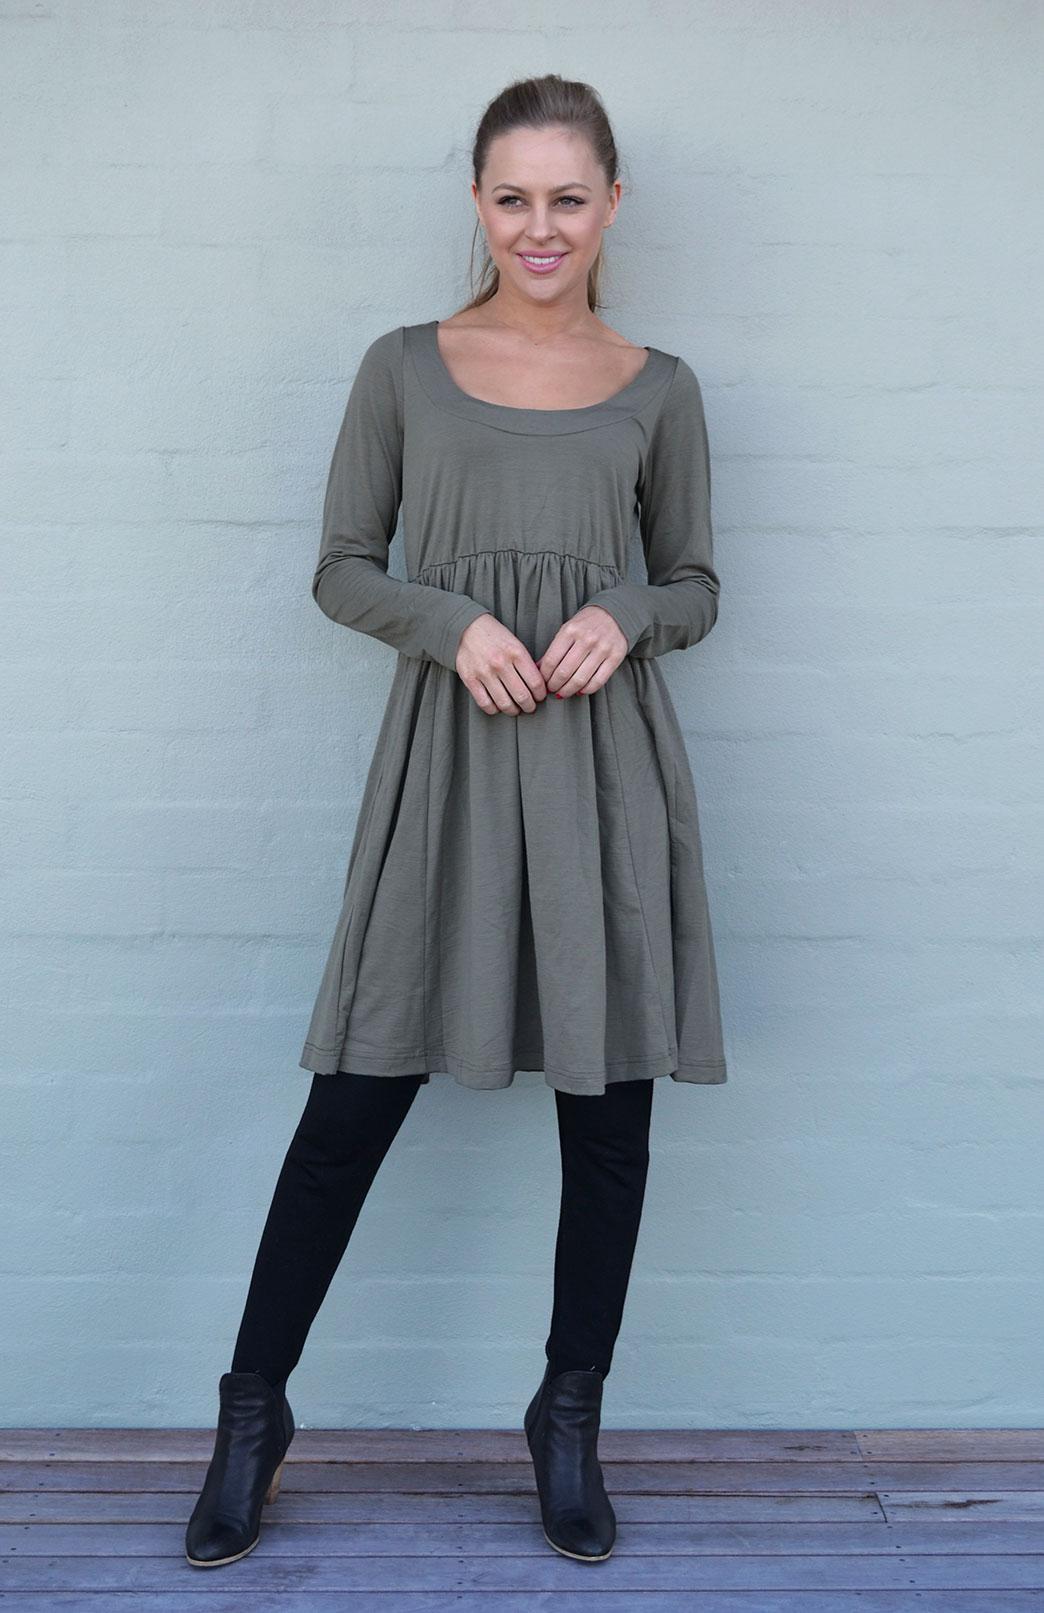 Long Sleeve Gathered Dress - Smitten Merino Tasmania Australia